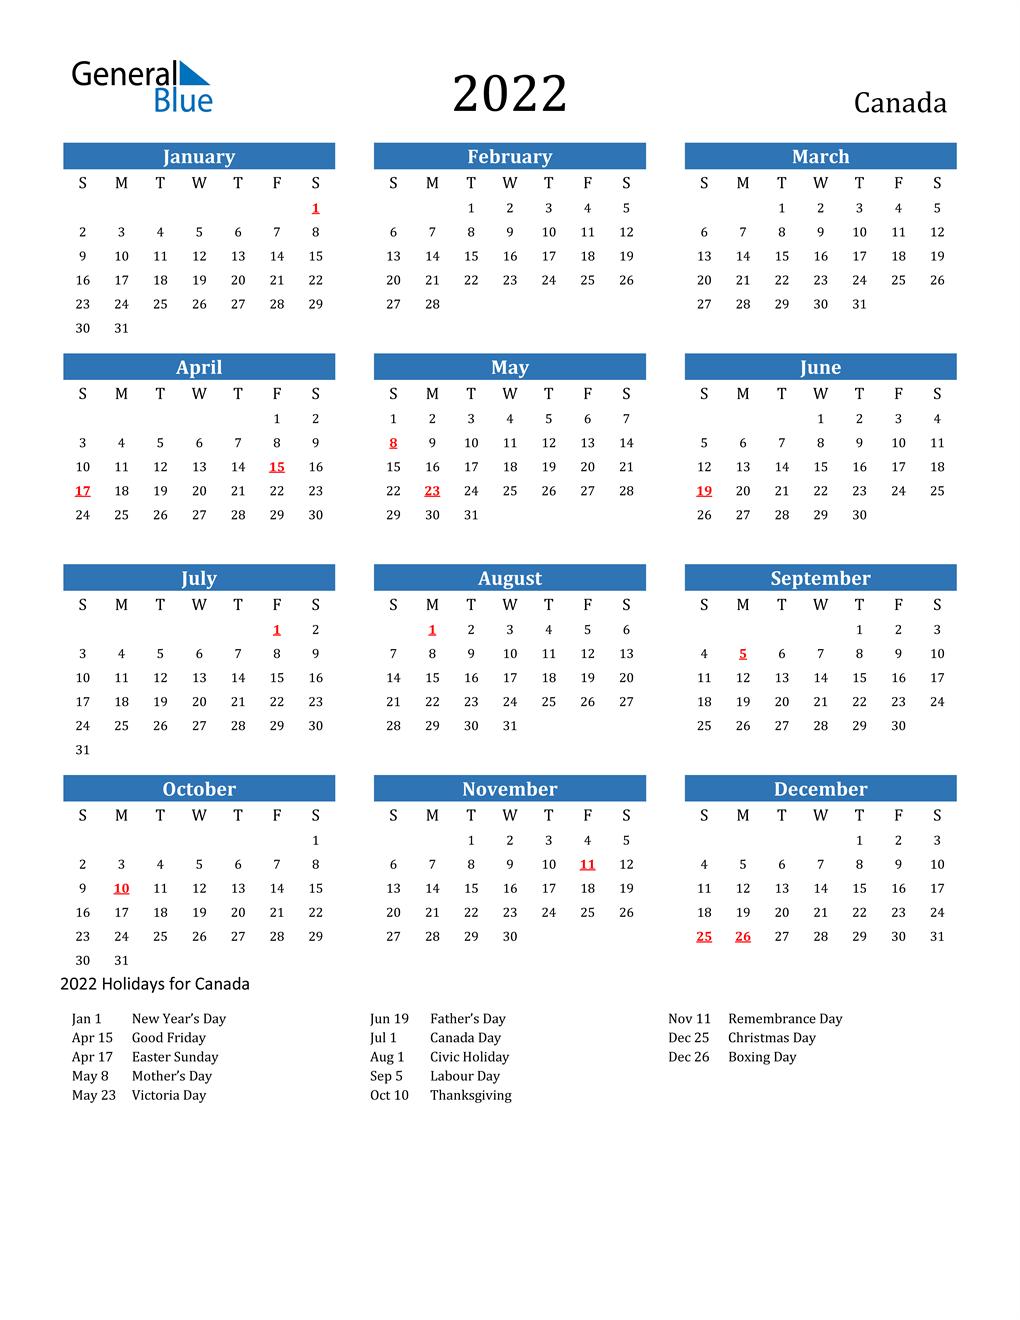 2022 Canada Calendar With Holidays